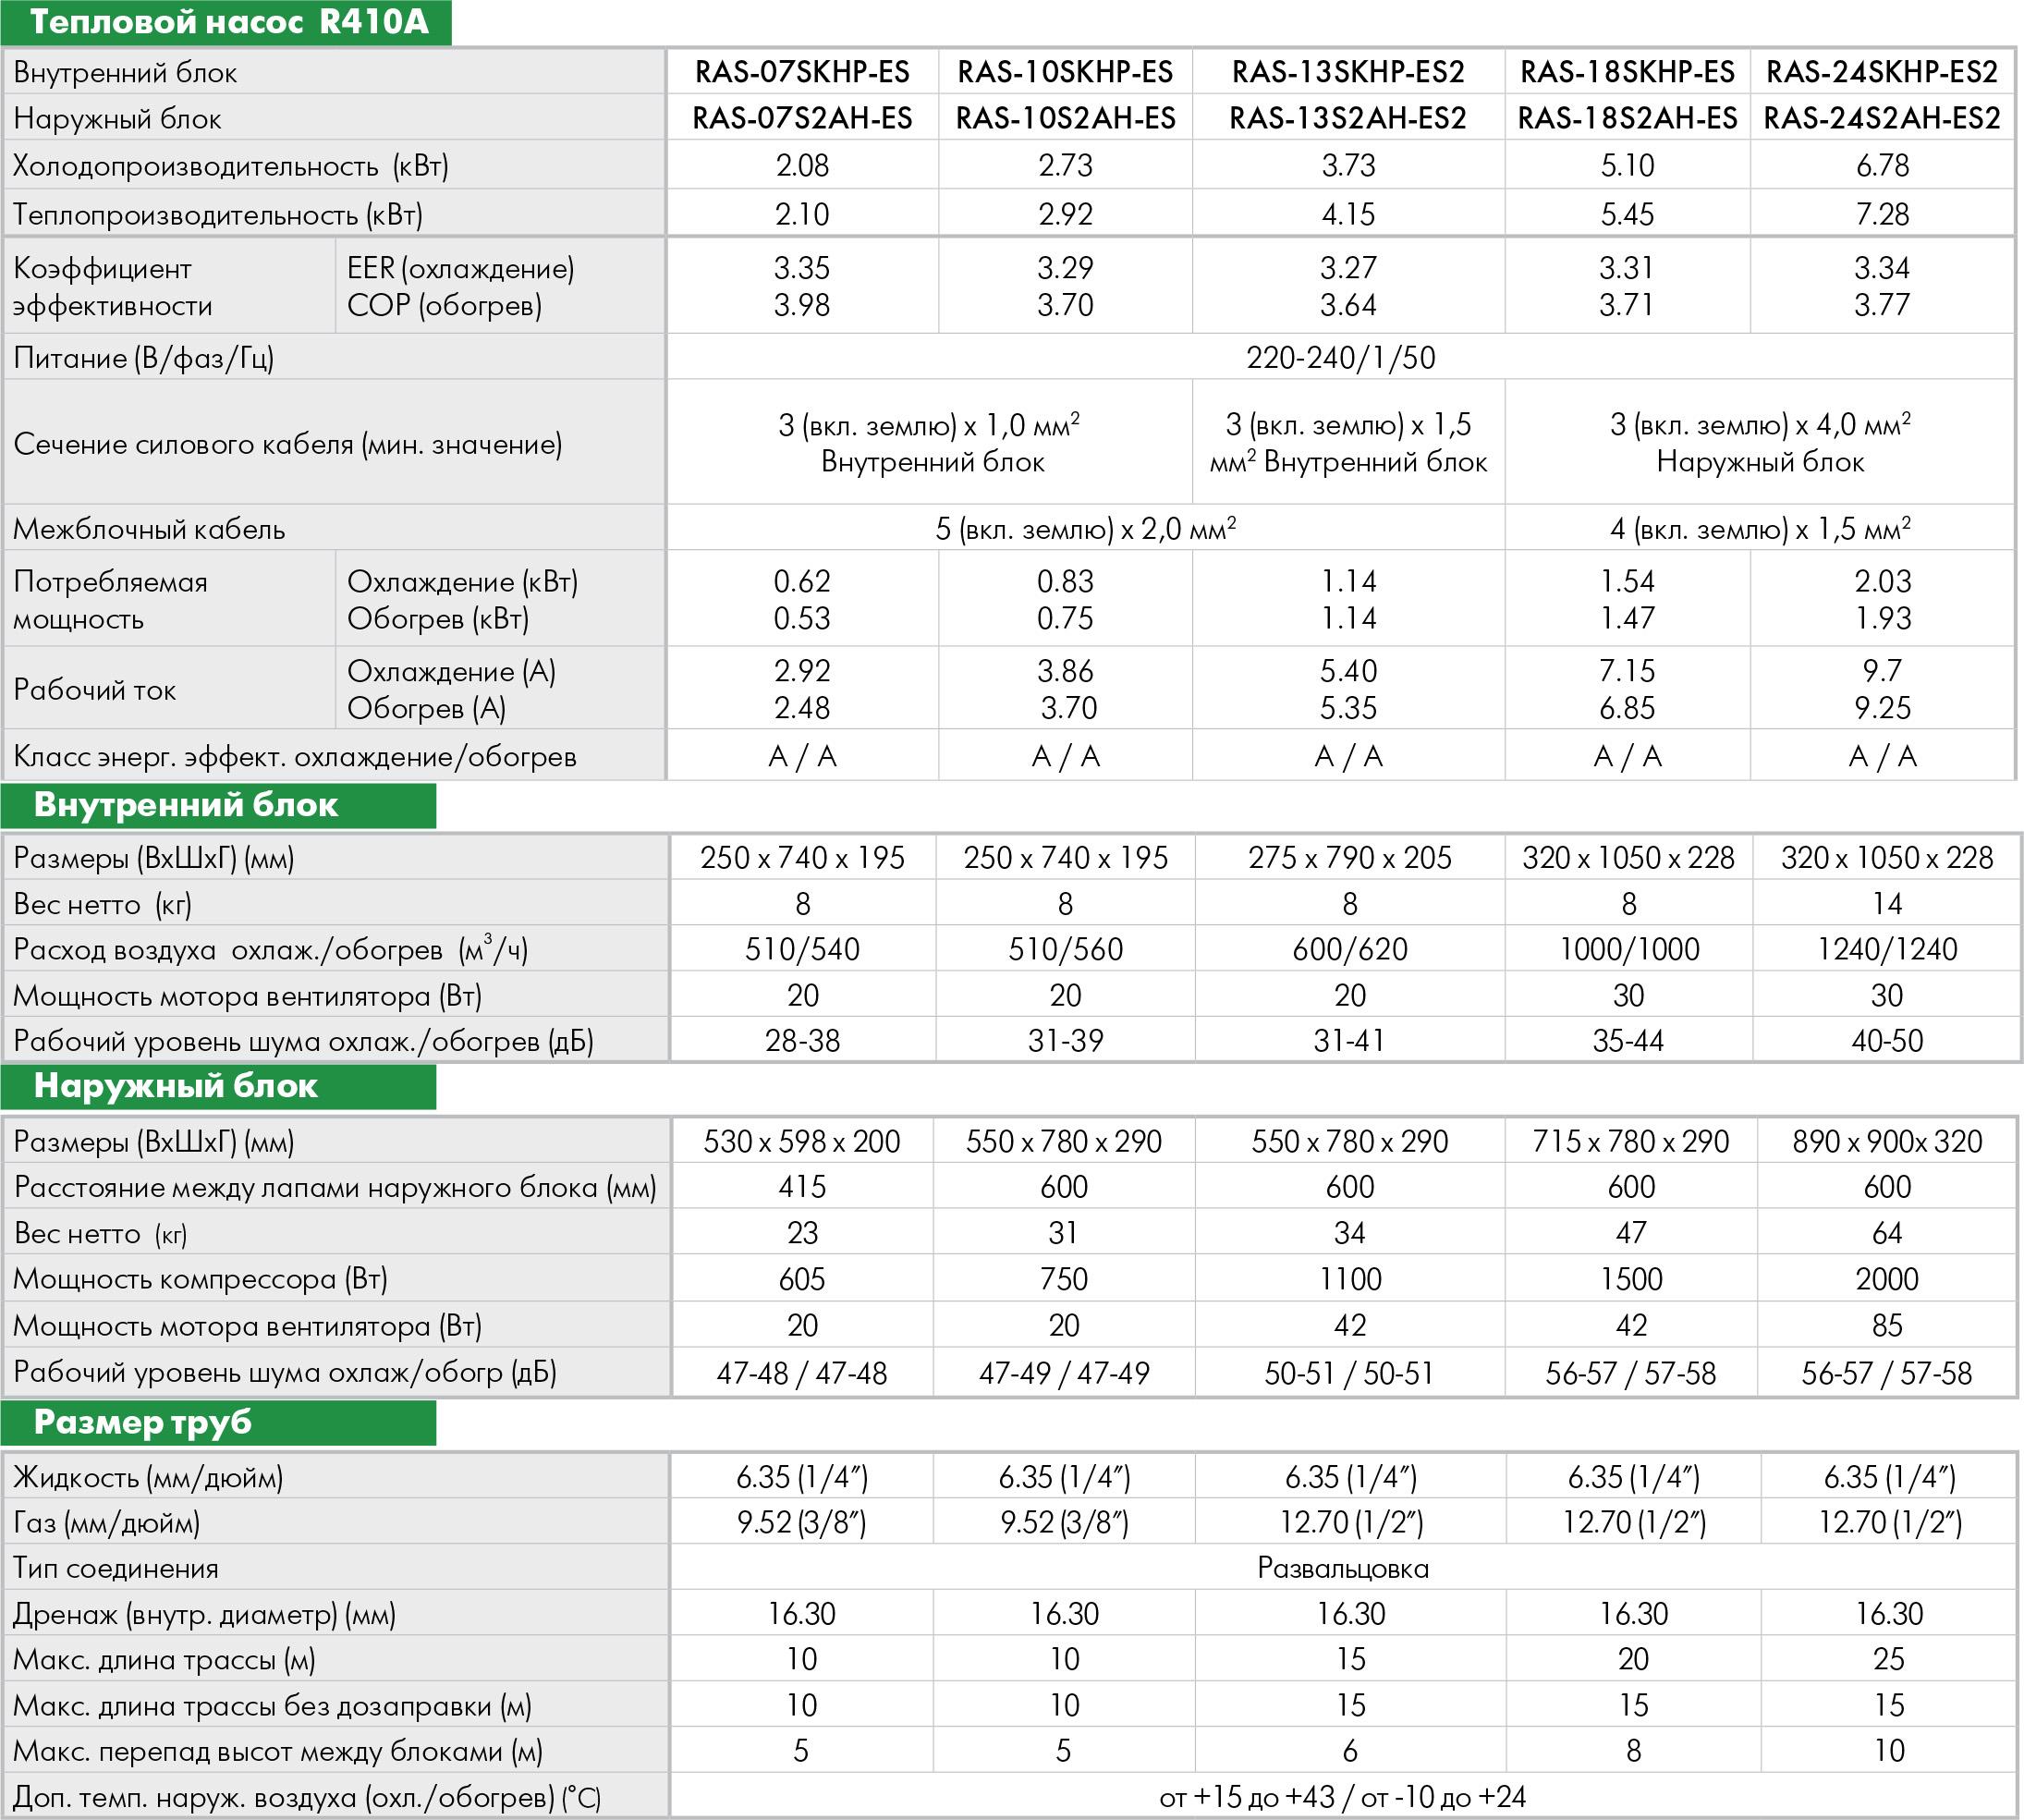 Технические характеристики кондиционера Toshiba RAS-10SKHP-ES / RAS-10S2AH-ES серии SKHP